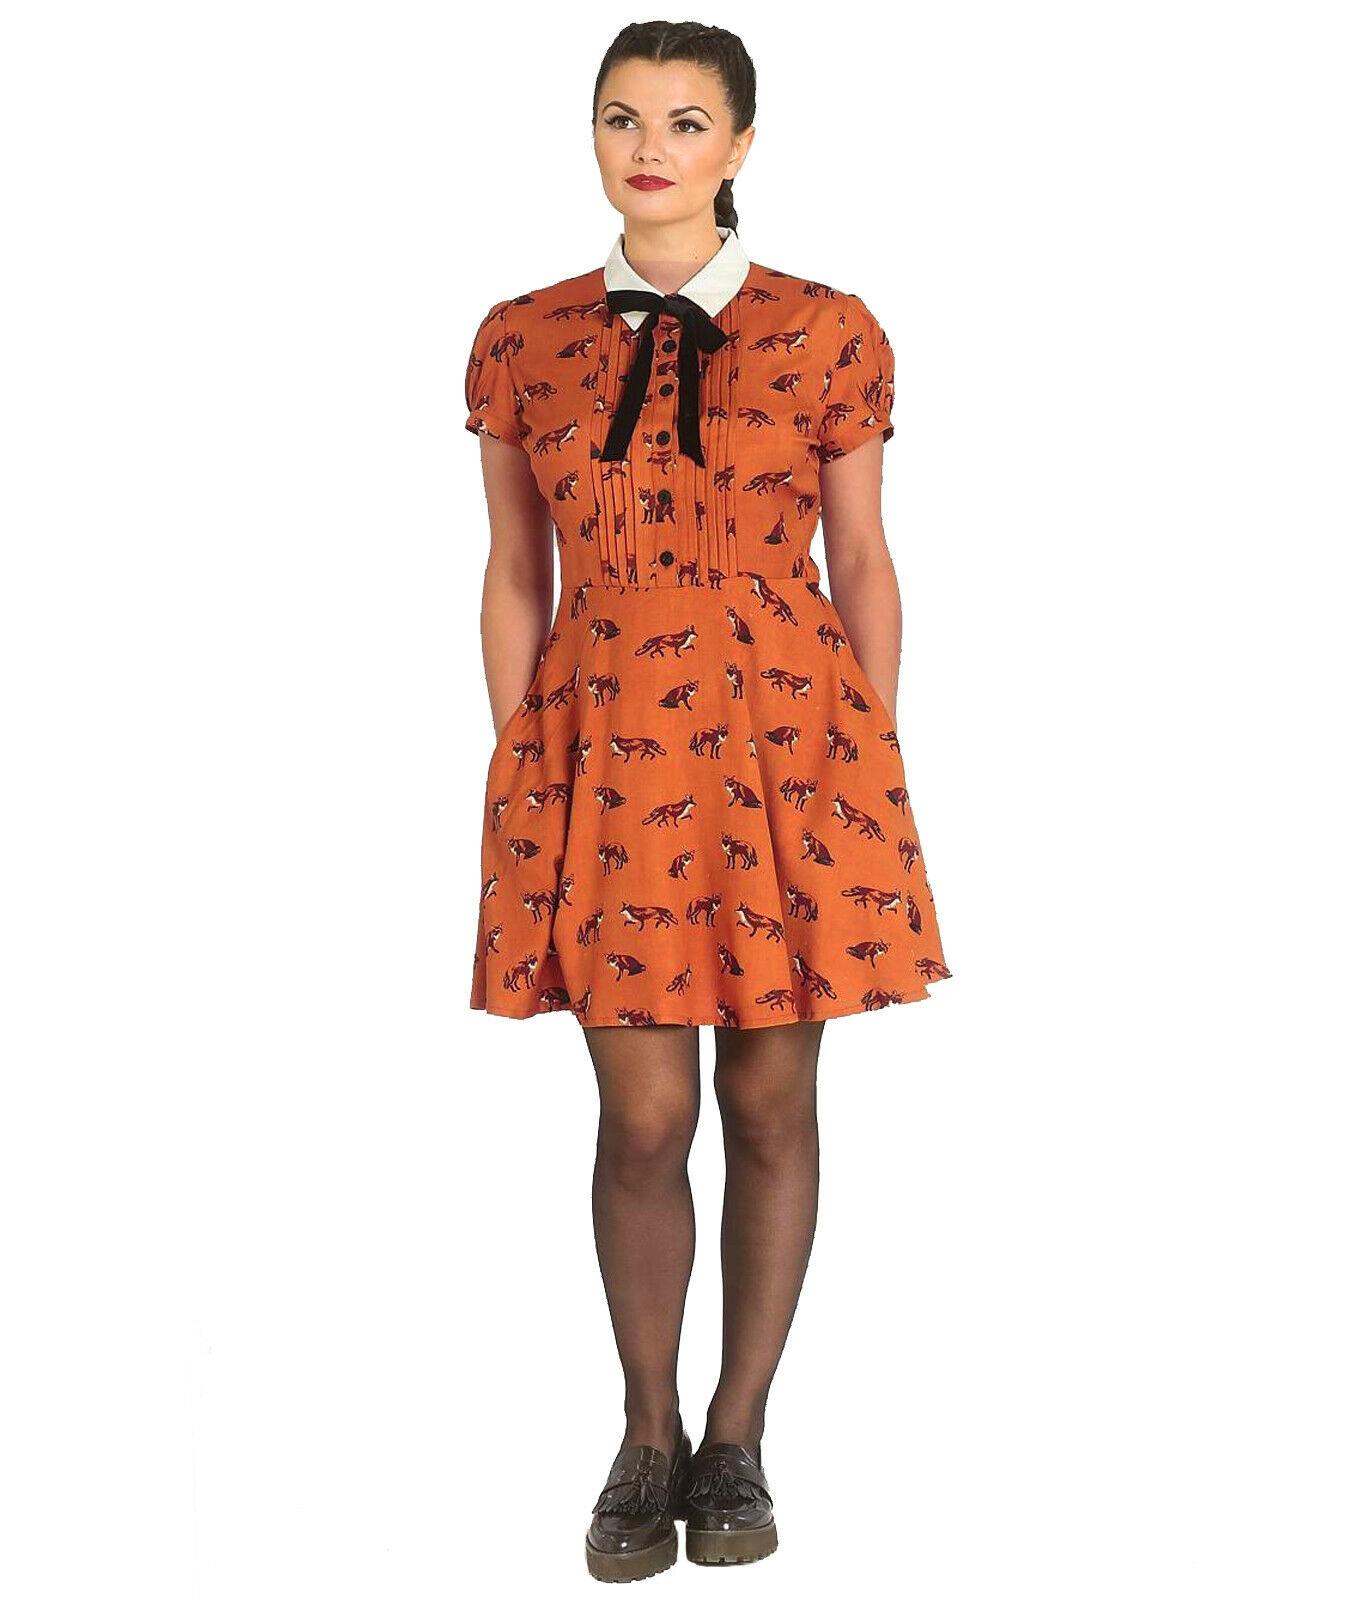 Hell-Bunny-40s-50s-Brown-Mini-Dress-Pin-Up-VIXEY-Vixen-Fox-Print-All-Sizes thumbnail 15